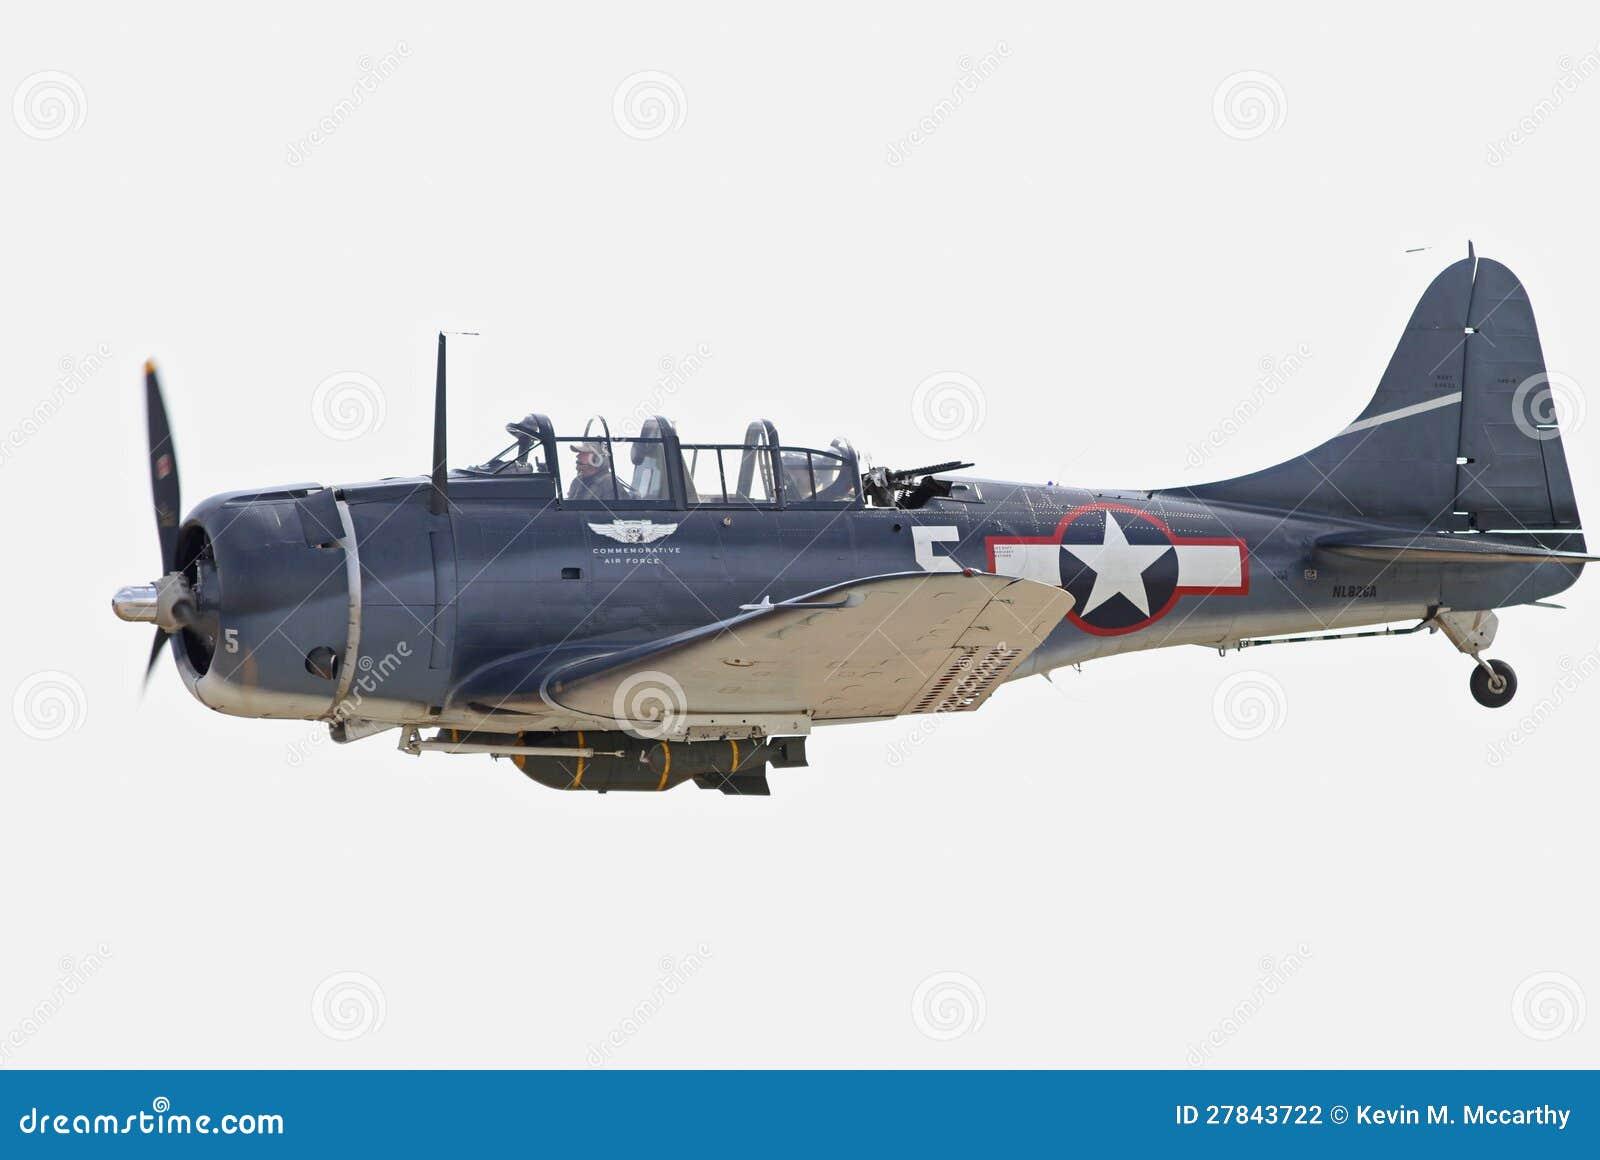 Druga Wojna Światowa Samolot nurkowa Samolot